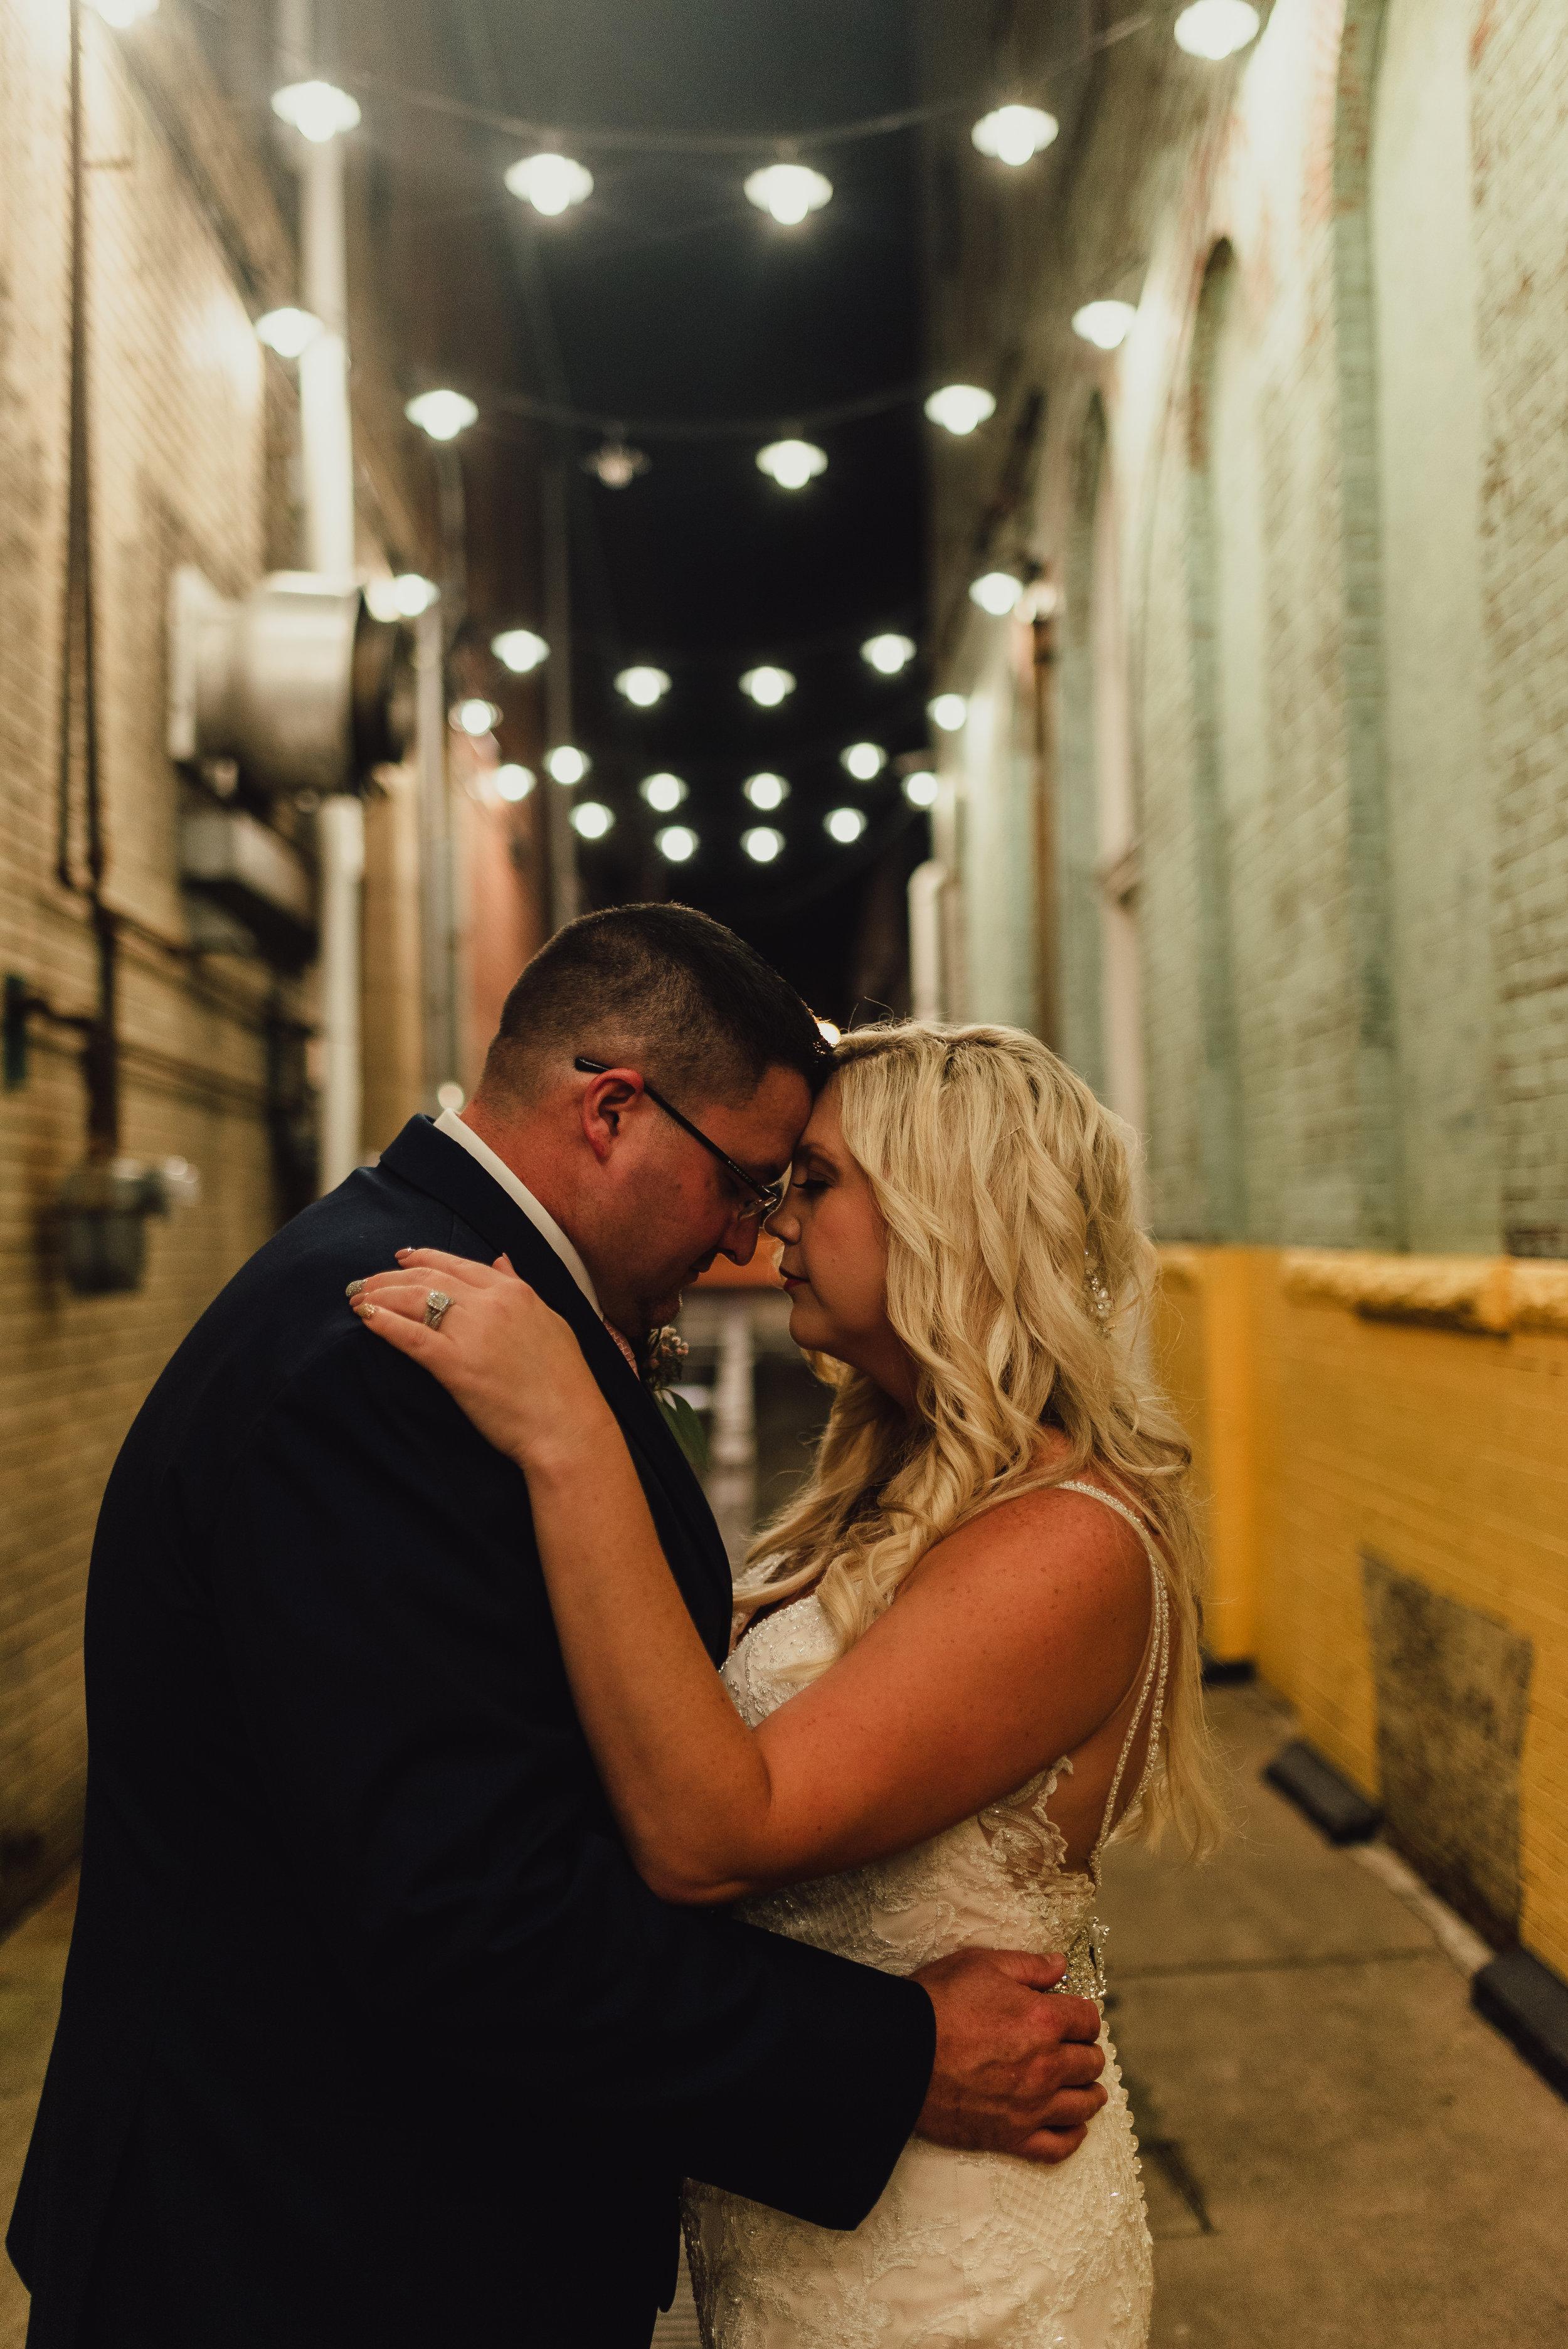 east-tn-wedding-photographer-tennessee-elopement-photographer-kingsport-tn-wedding-photographer (863 of 1001).jpg